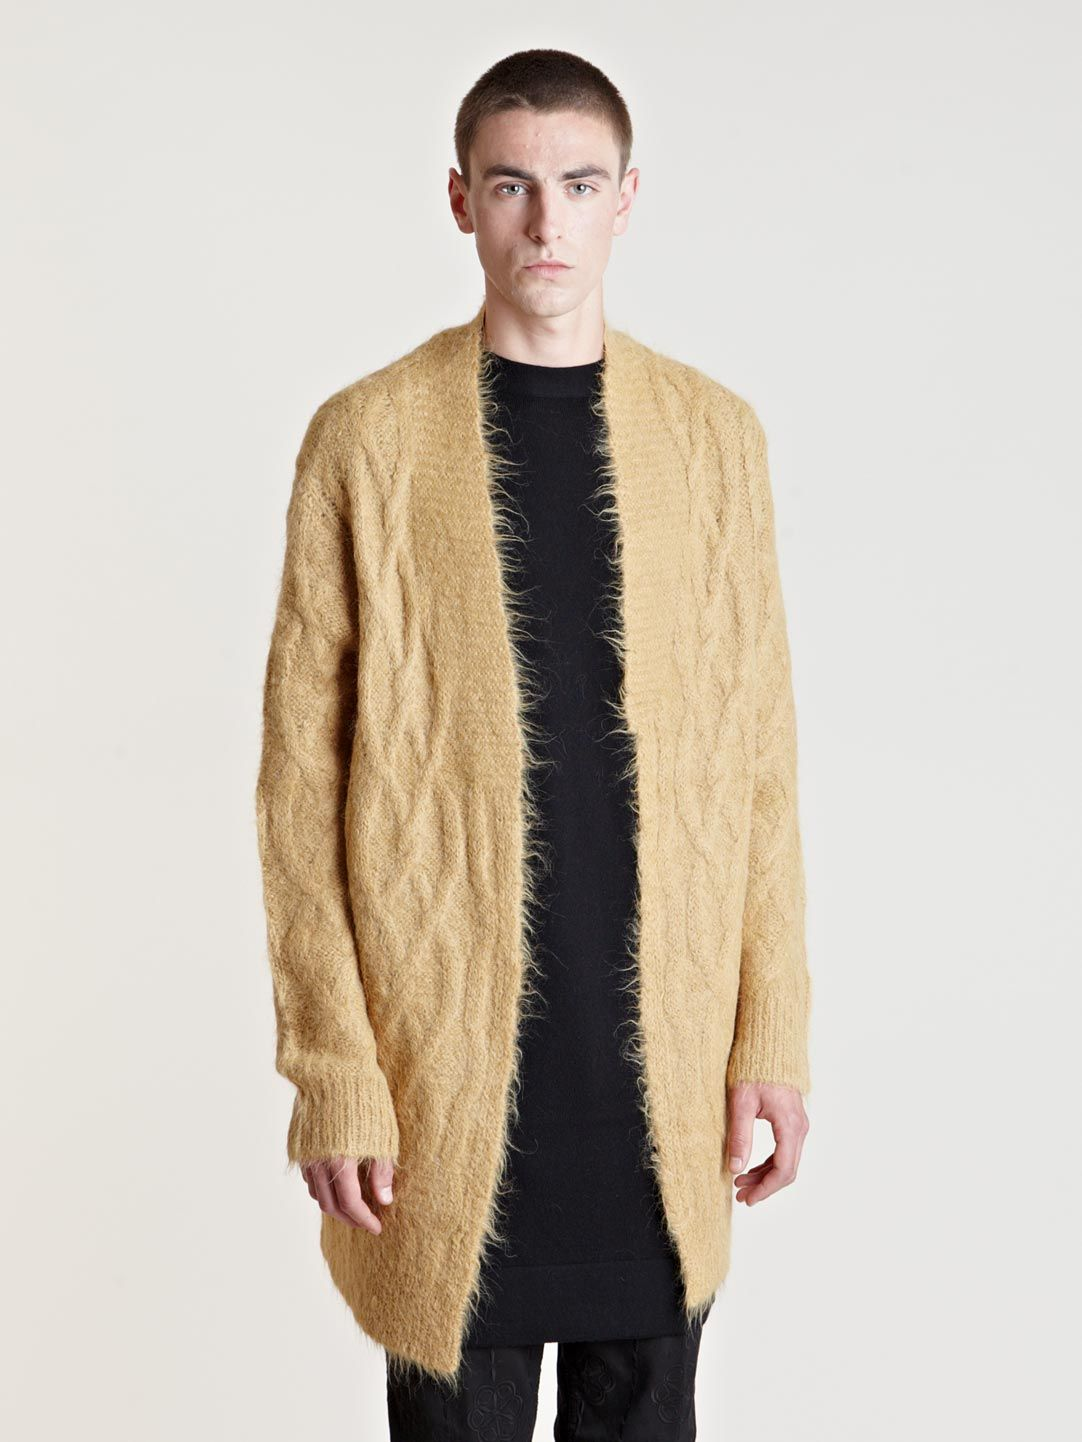 Dries Van Noten Men's Titan Sweater | KNIT | Pinterest